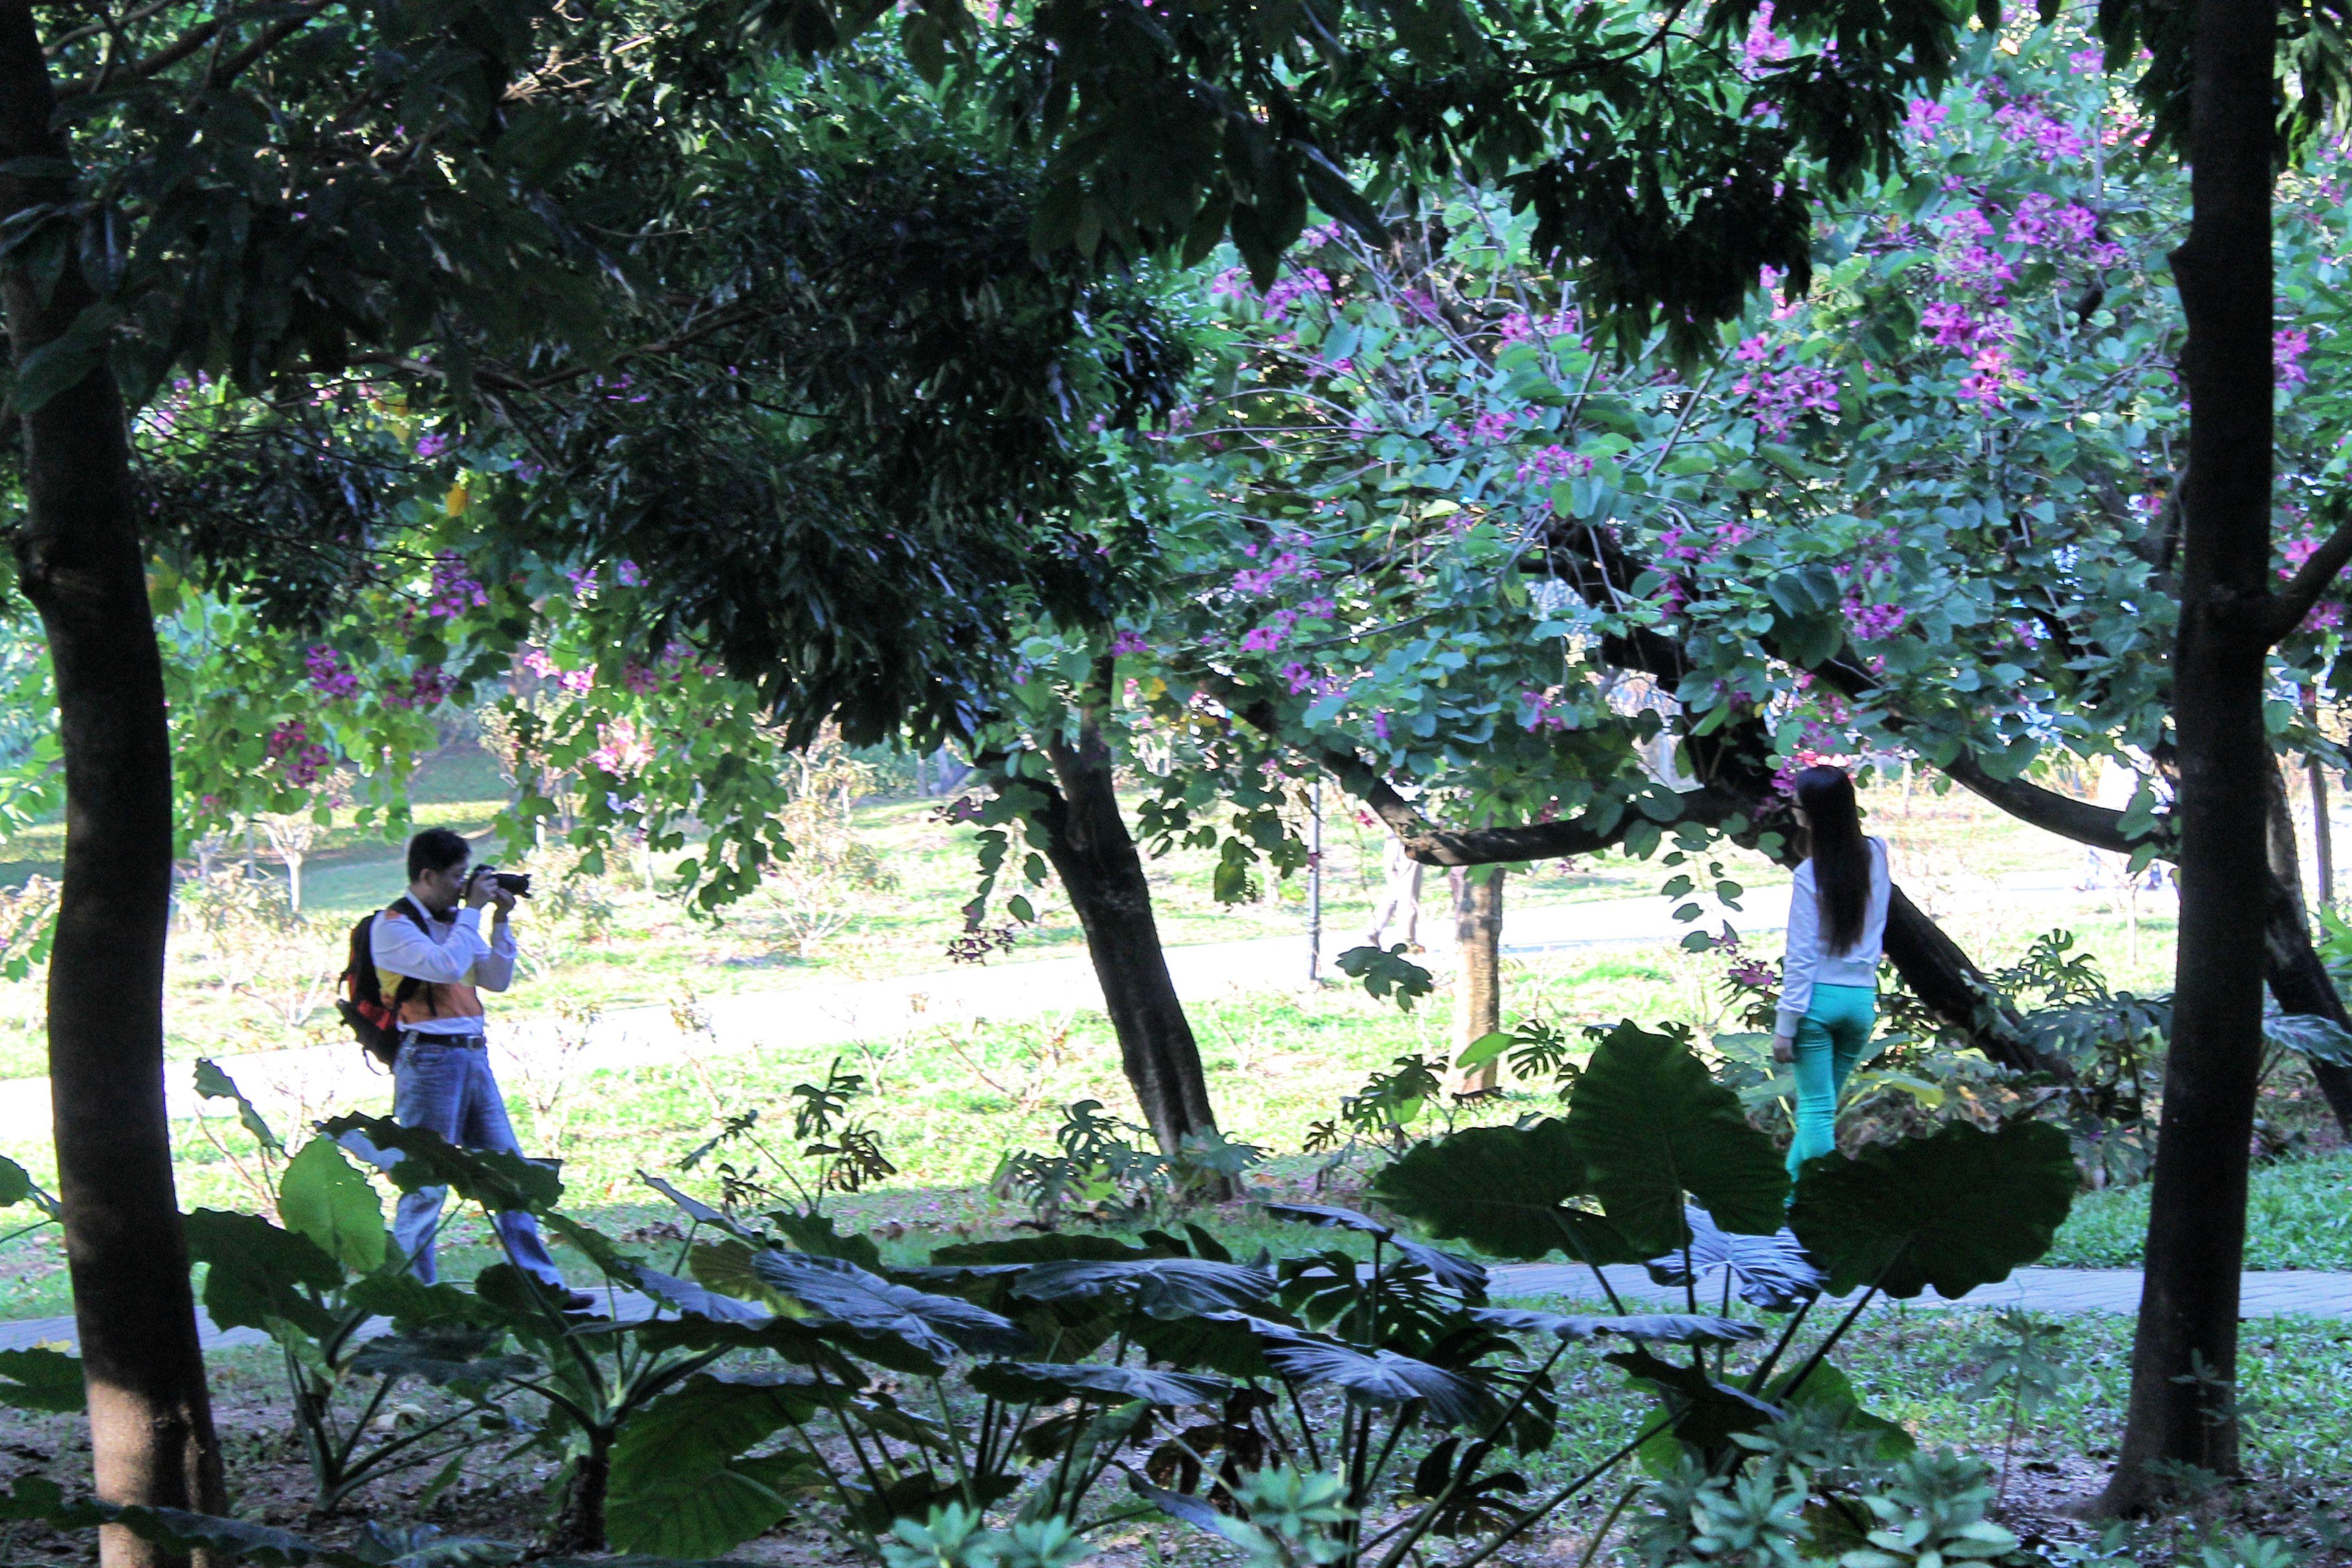 Shenzhen lotus park. Capturing the summer trees.